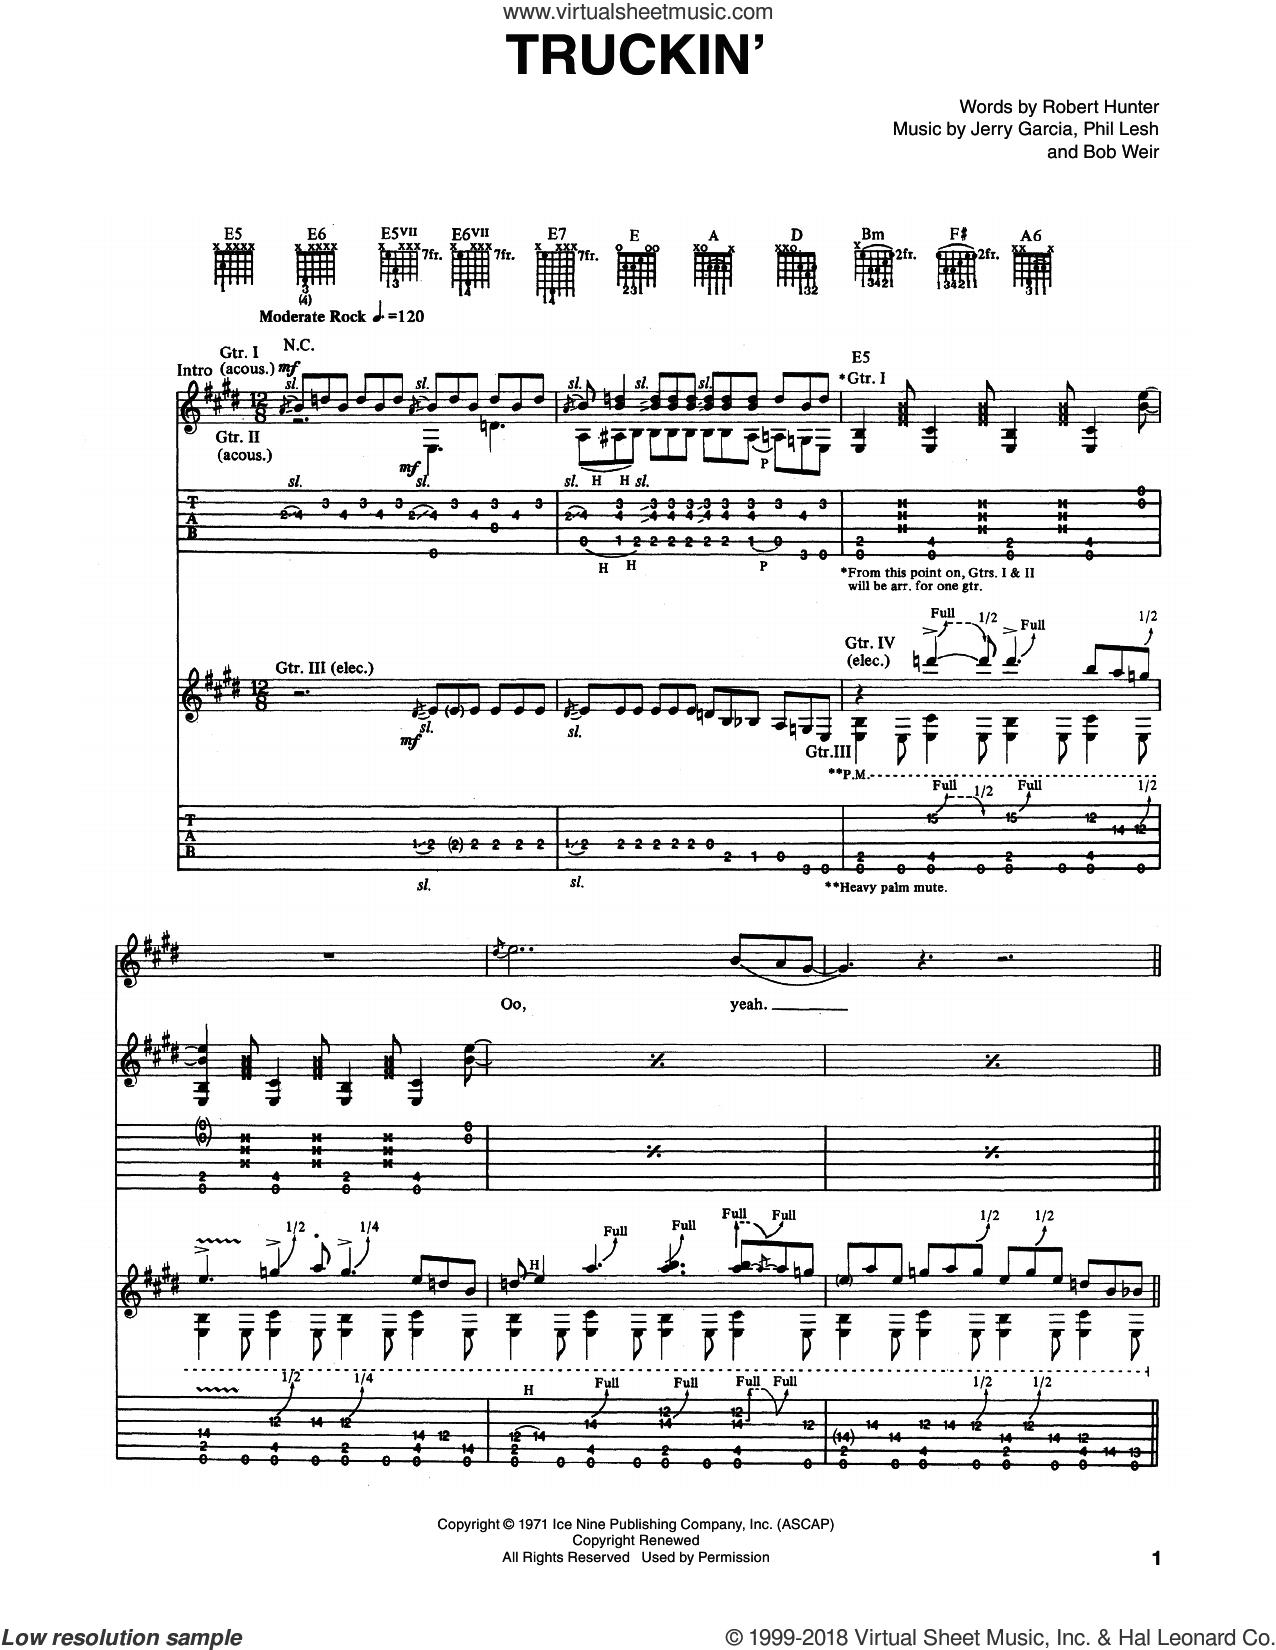 Truckin' sheet music for guitar (tablature) by Grateful Dead, Bob Weir, Jerry Garcia, Phil Lesh and Robert Hunter, intermediate skill level